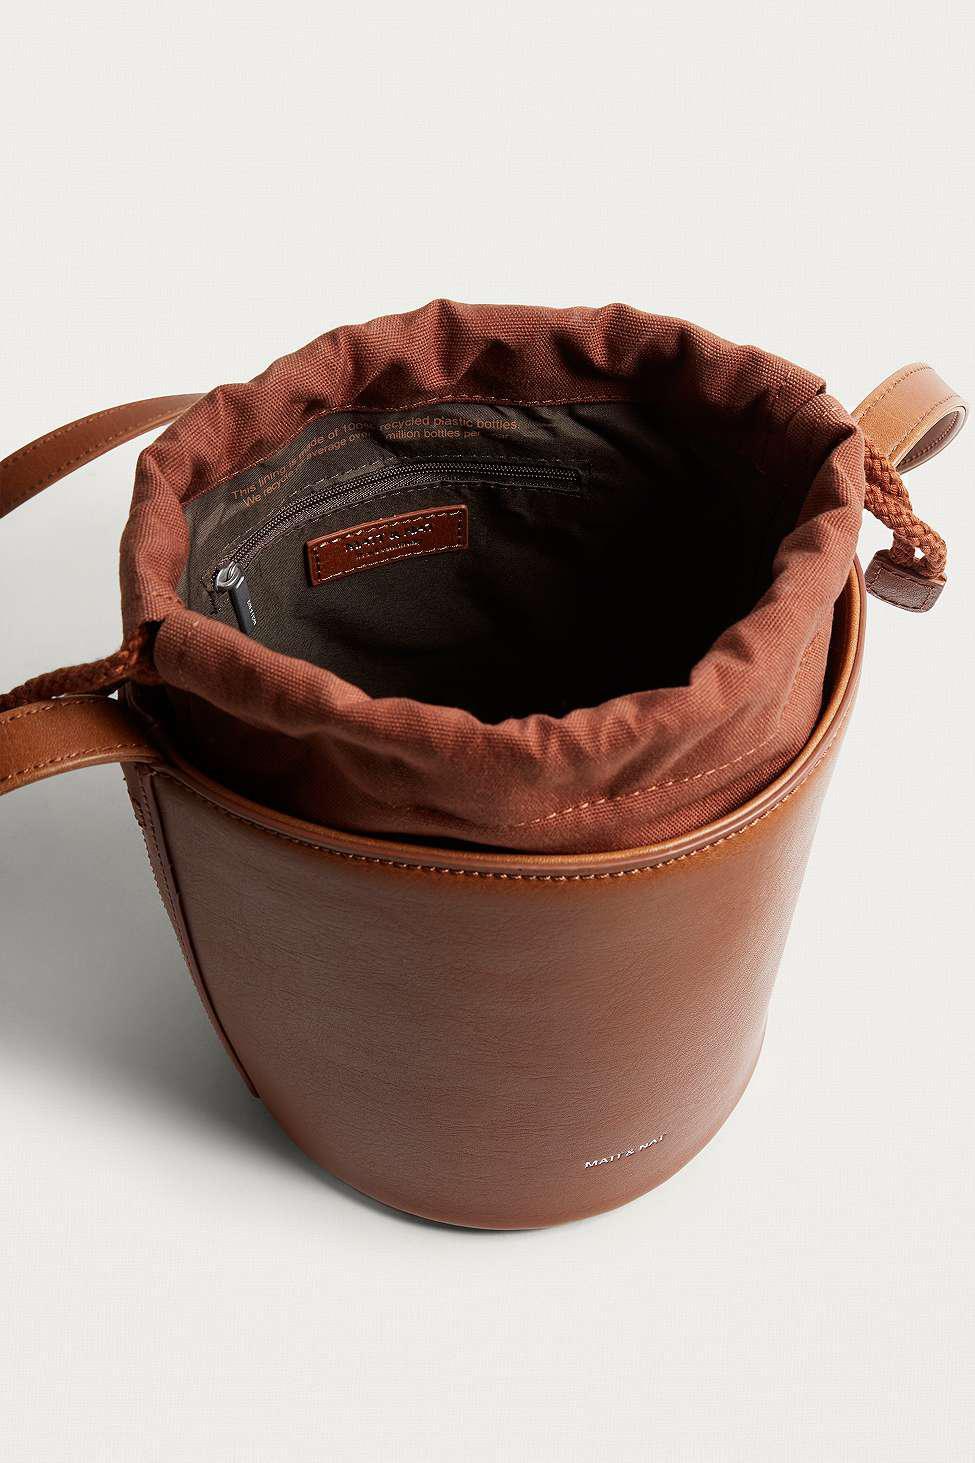 Matt & Nat Leather Bini Chili Bucket Crossbody in Brown